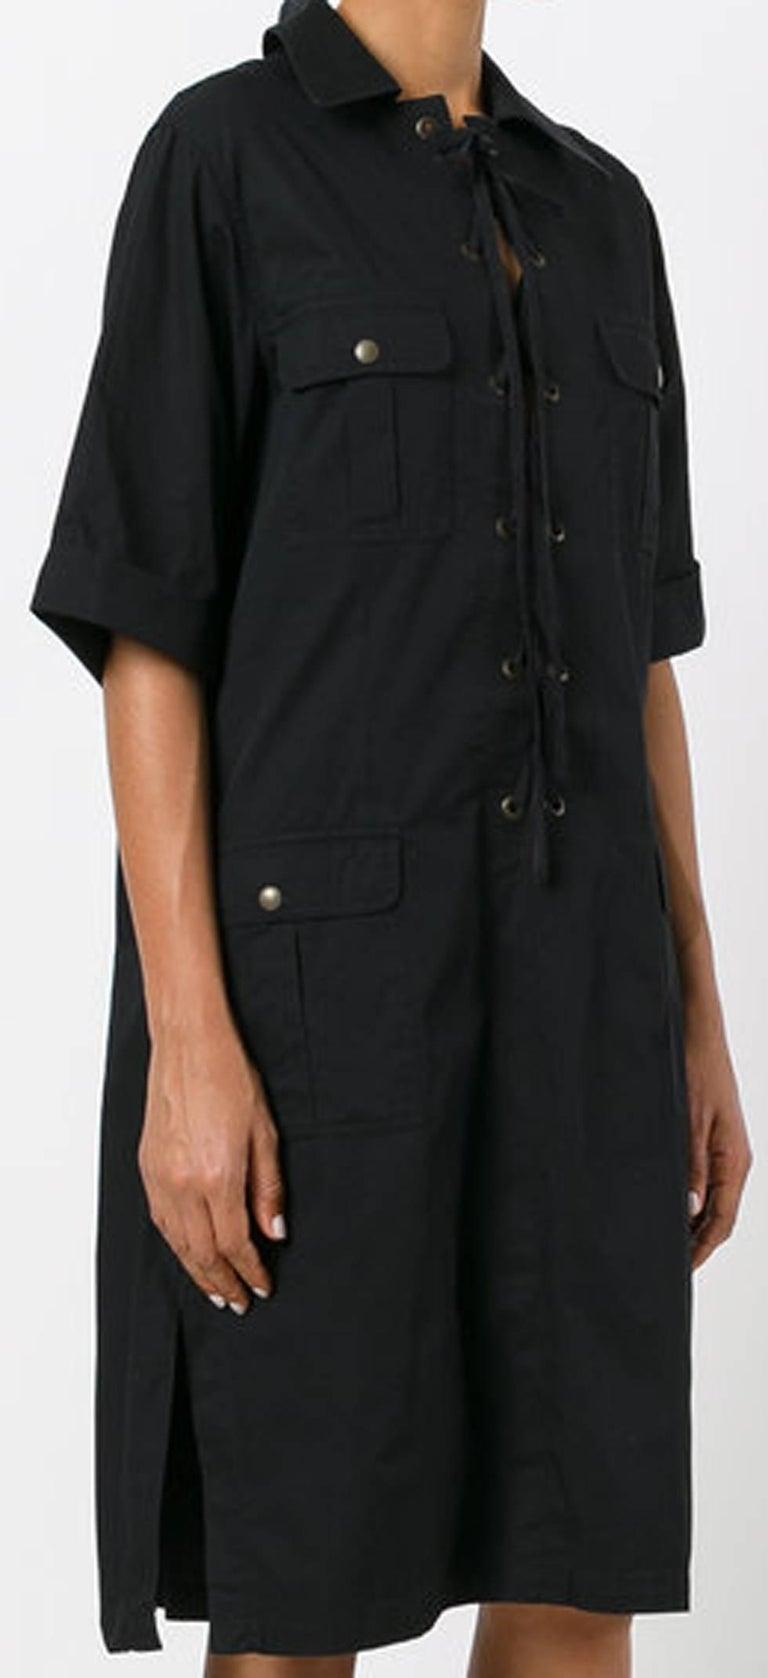 Yves Saint Laurent Black Cotton Safari Dress  3